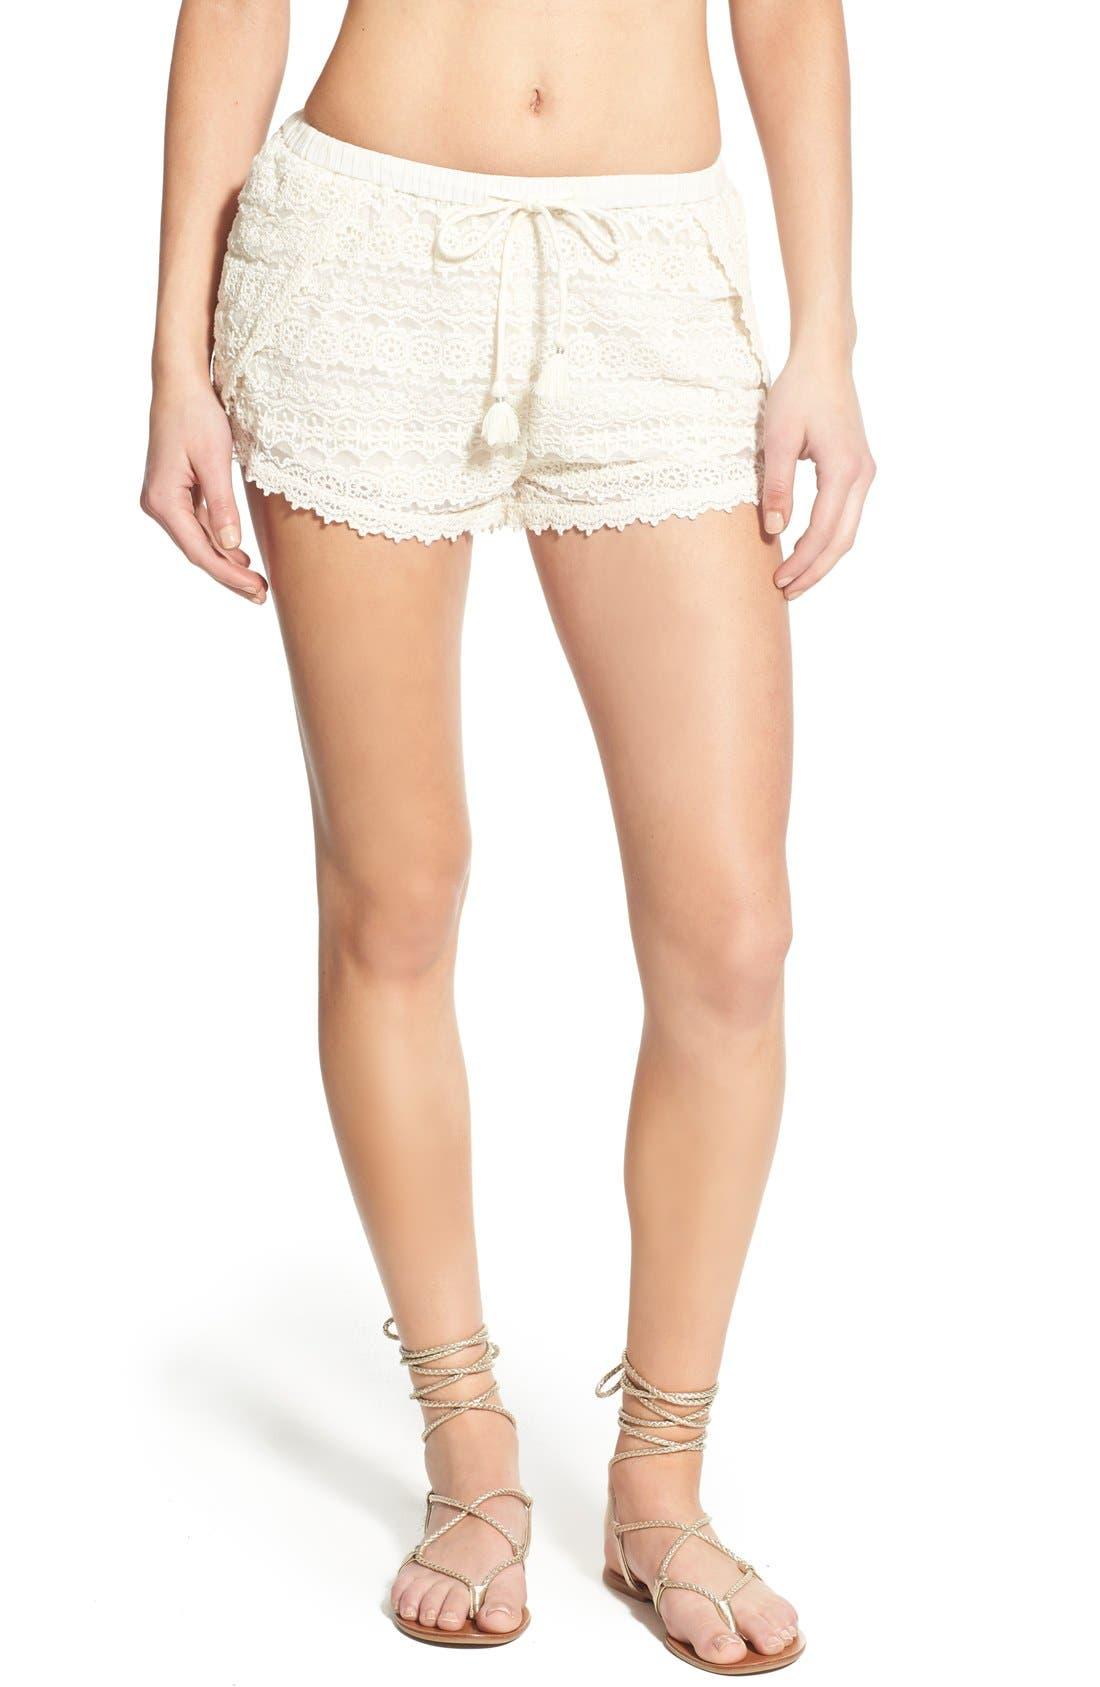 Alternate Image 1 Selected - Amuse Society 'Chelles' Lace Shorts